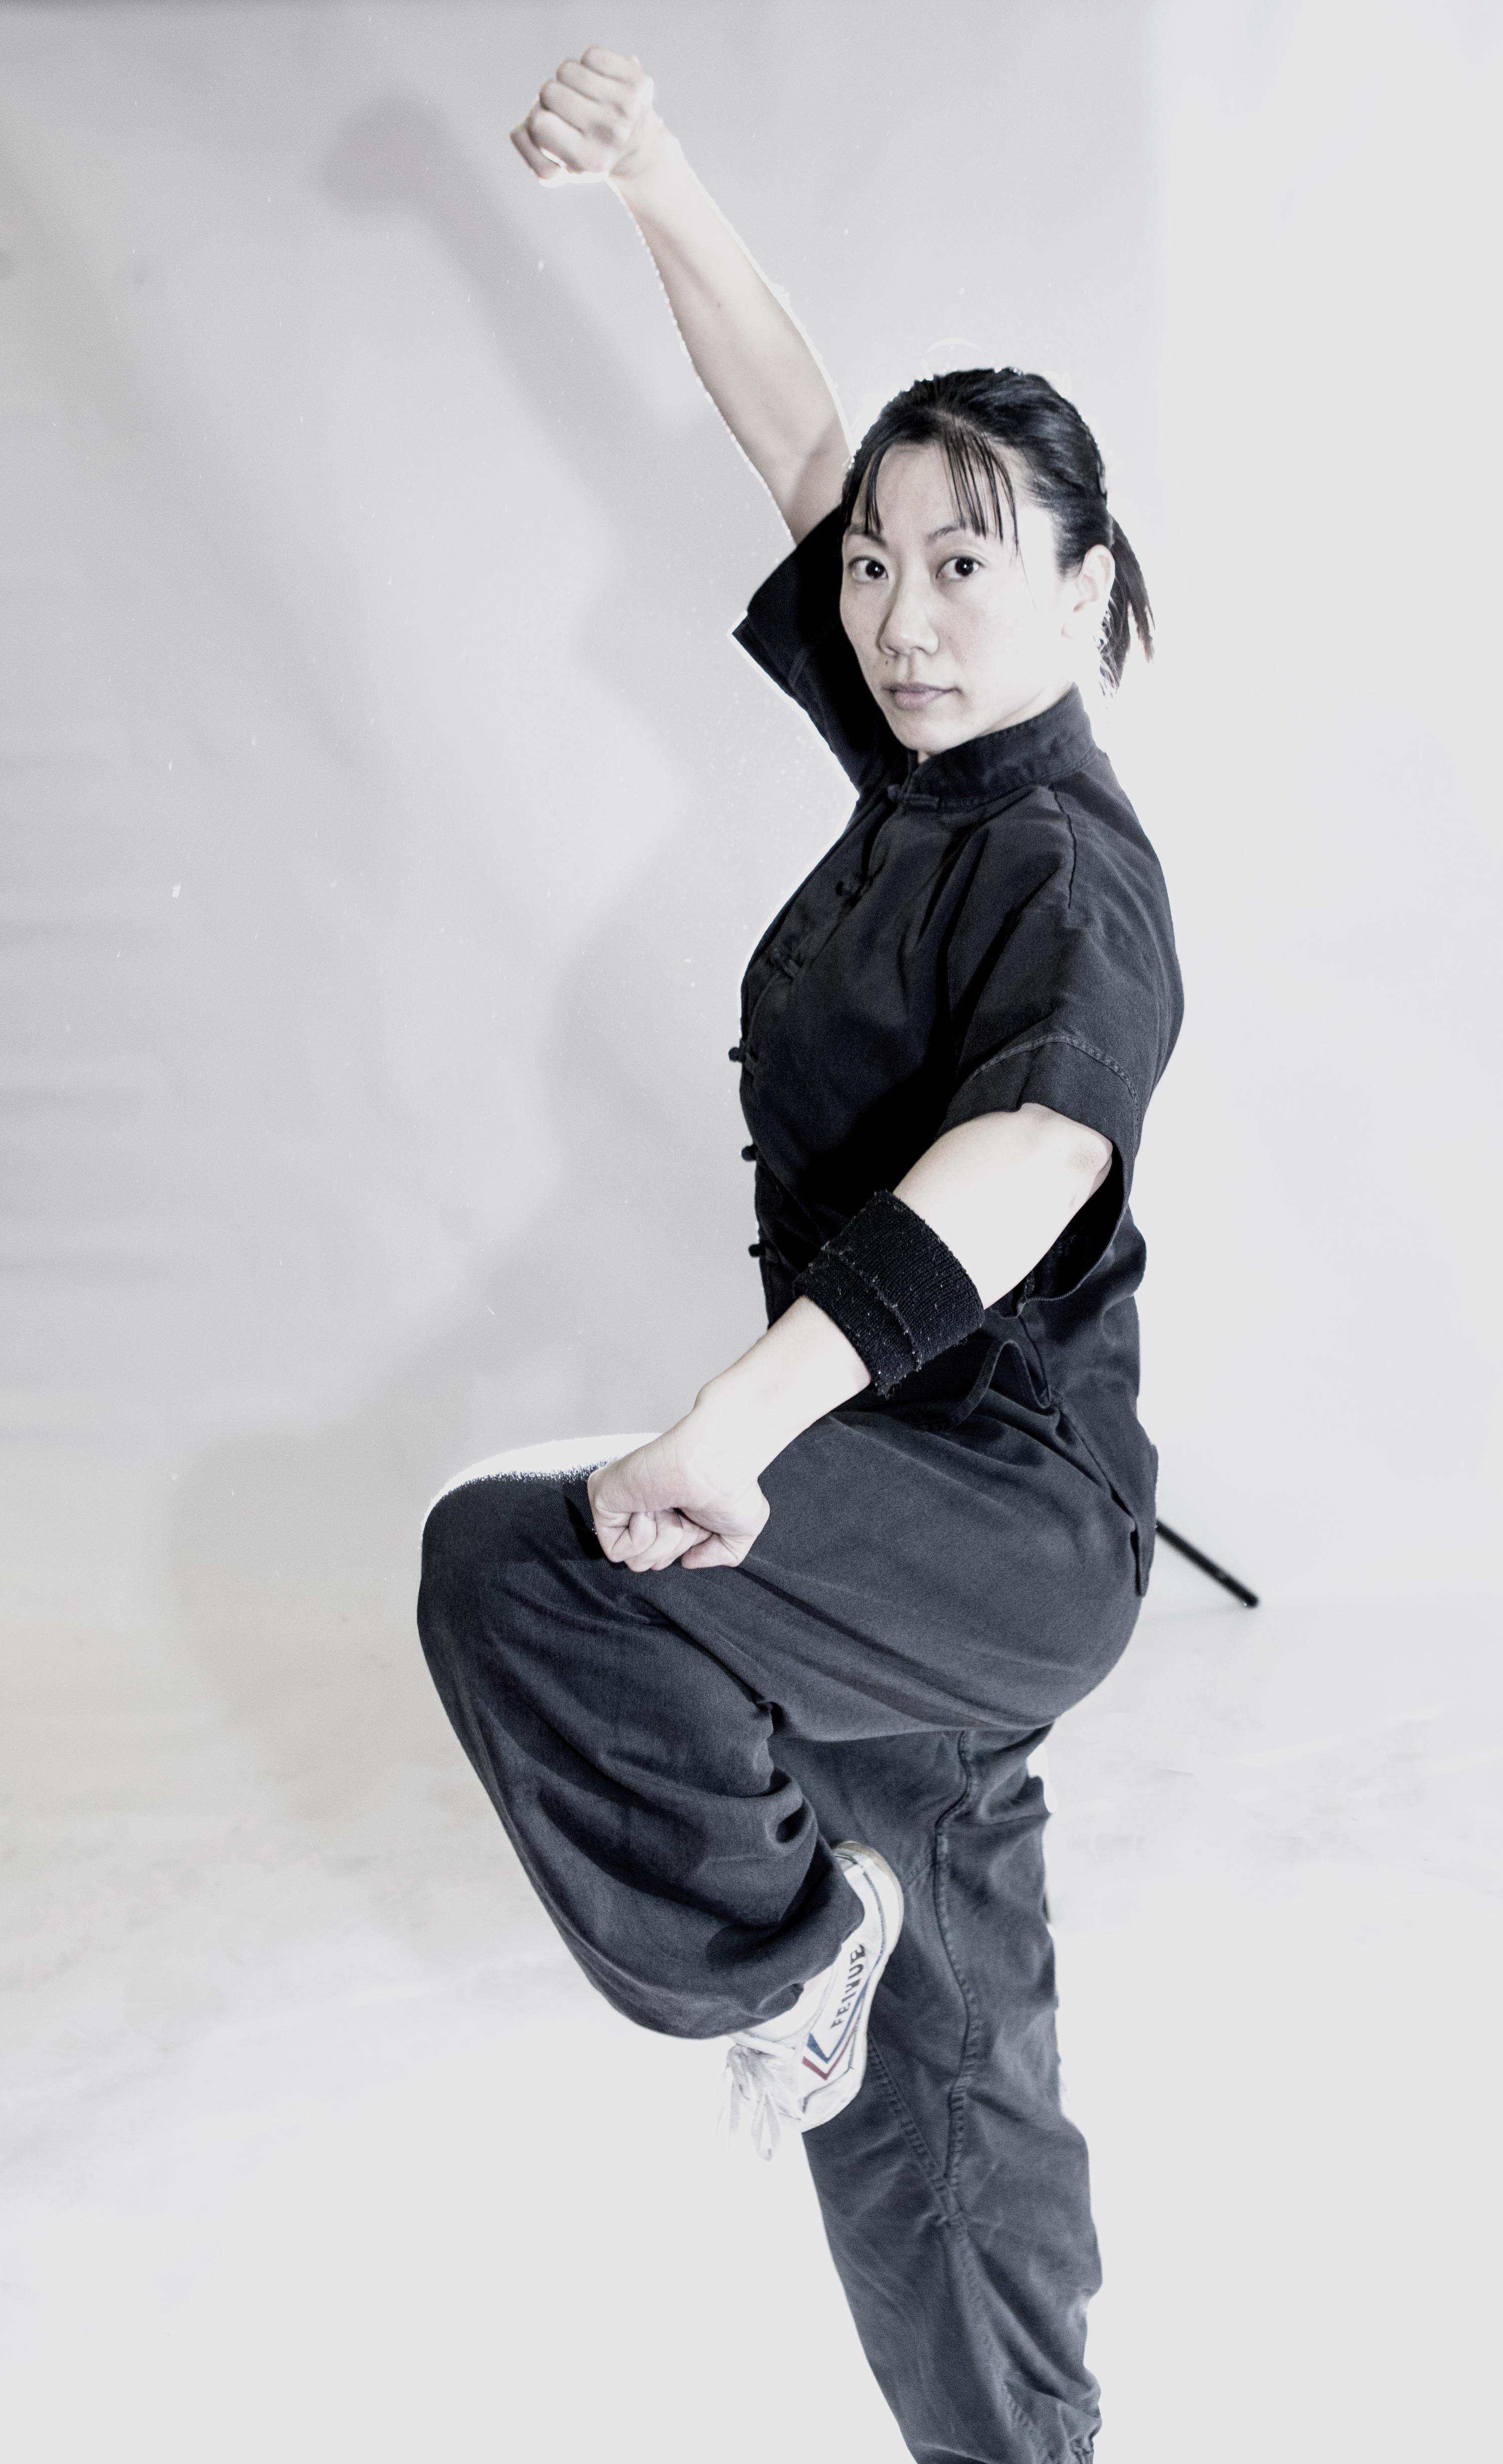 Jap girl stance mono Las vegas lohan School of Shaolin Kung Fu